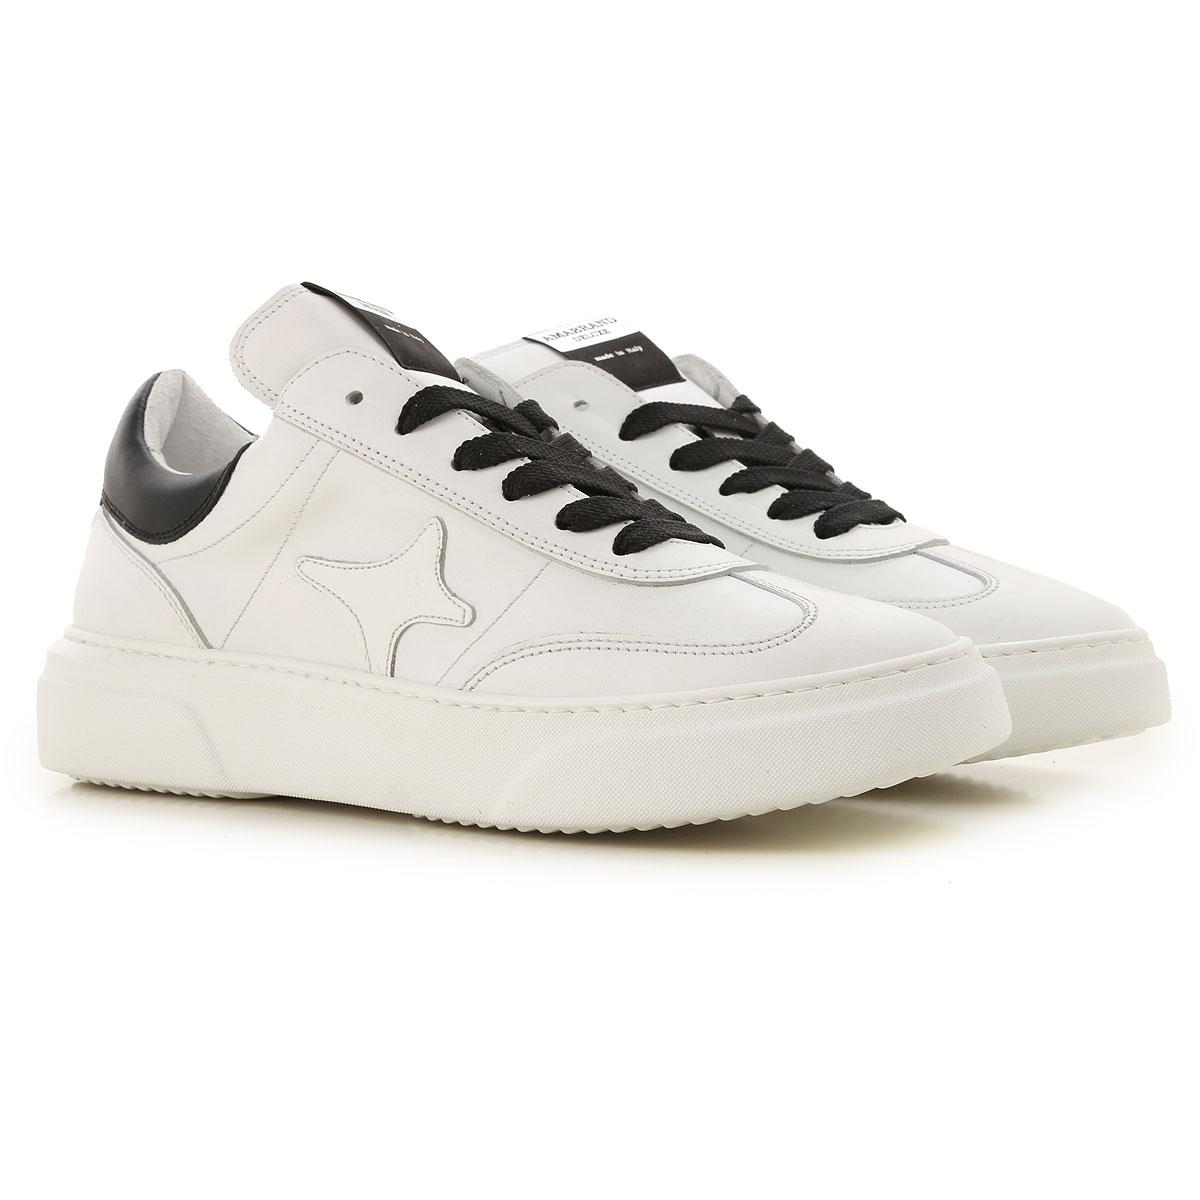 Ama Brand Sneakers for Men, White, Leather, 2019, EUR 40 - UK 6 - USA 7 EUR 43 - UK 9 - USA 9.5 EUR 41 - US 8 - UK 7